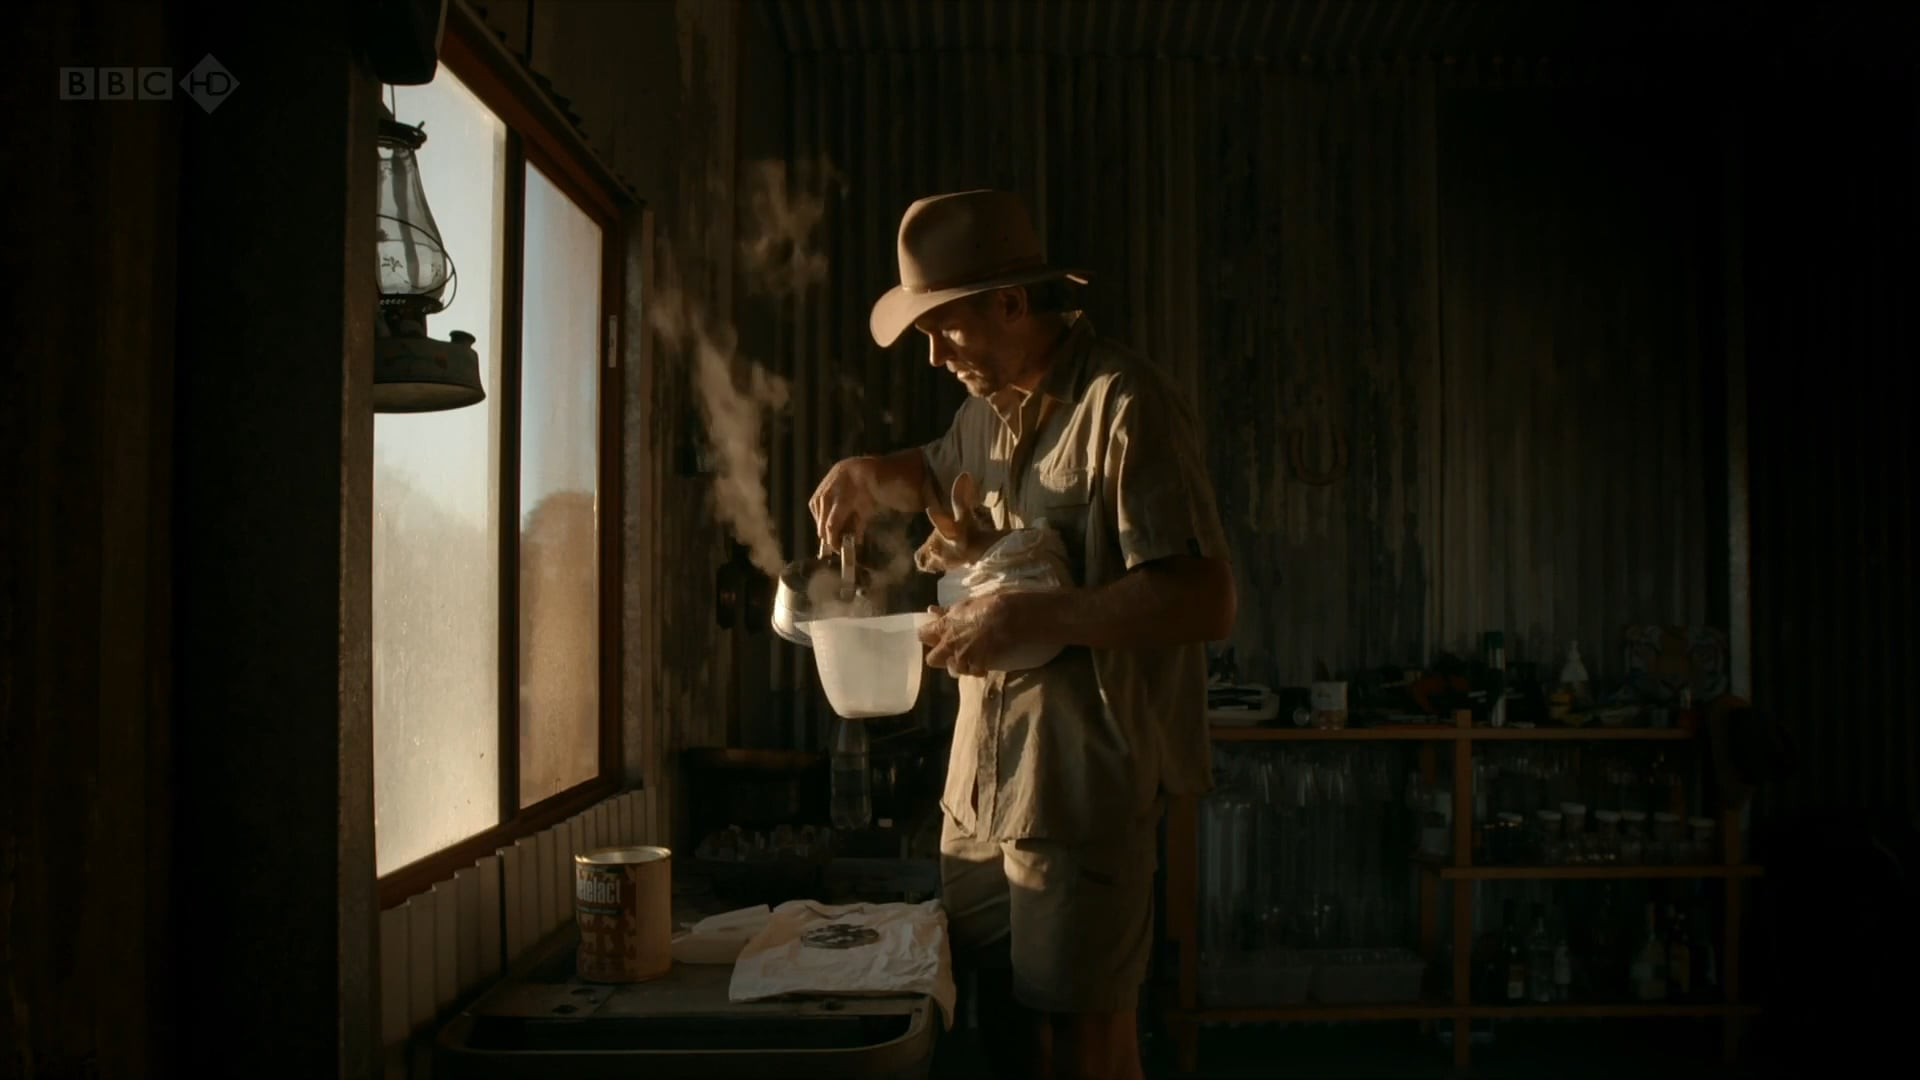 BBC Kangaroo Dundee, Narrated By Juliet Stevenson, Part 1 (Winner Jackson Hole, 2x Winner Montana, Nominee Grierson Award)